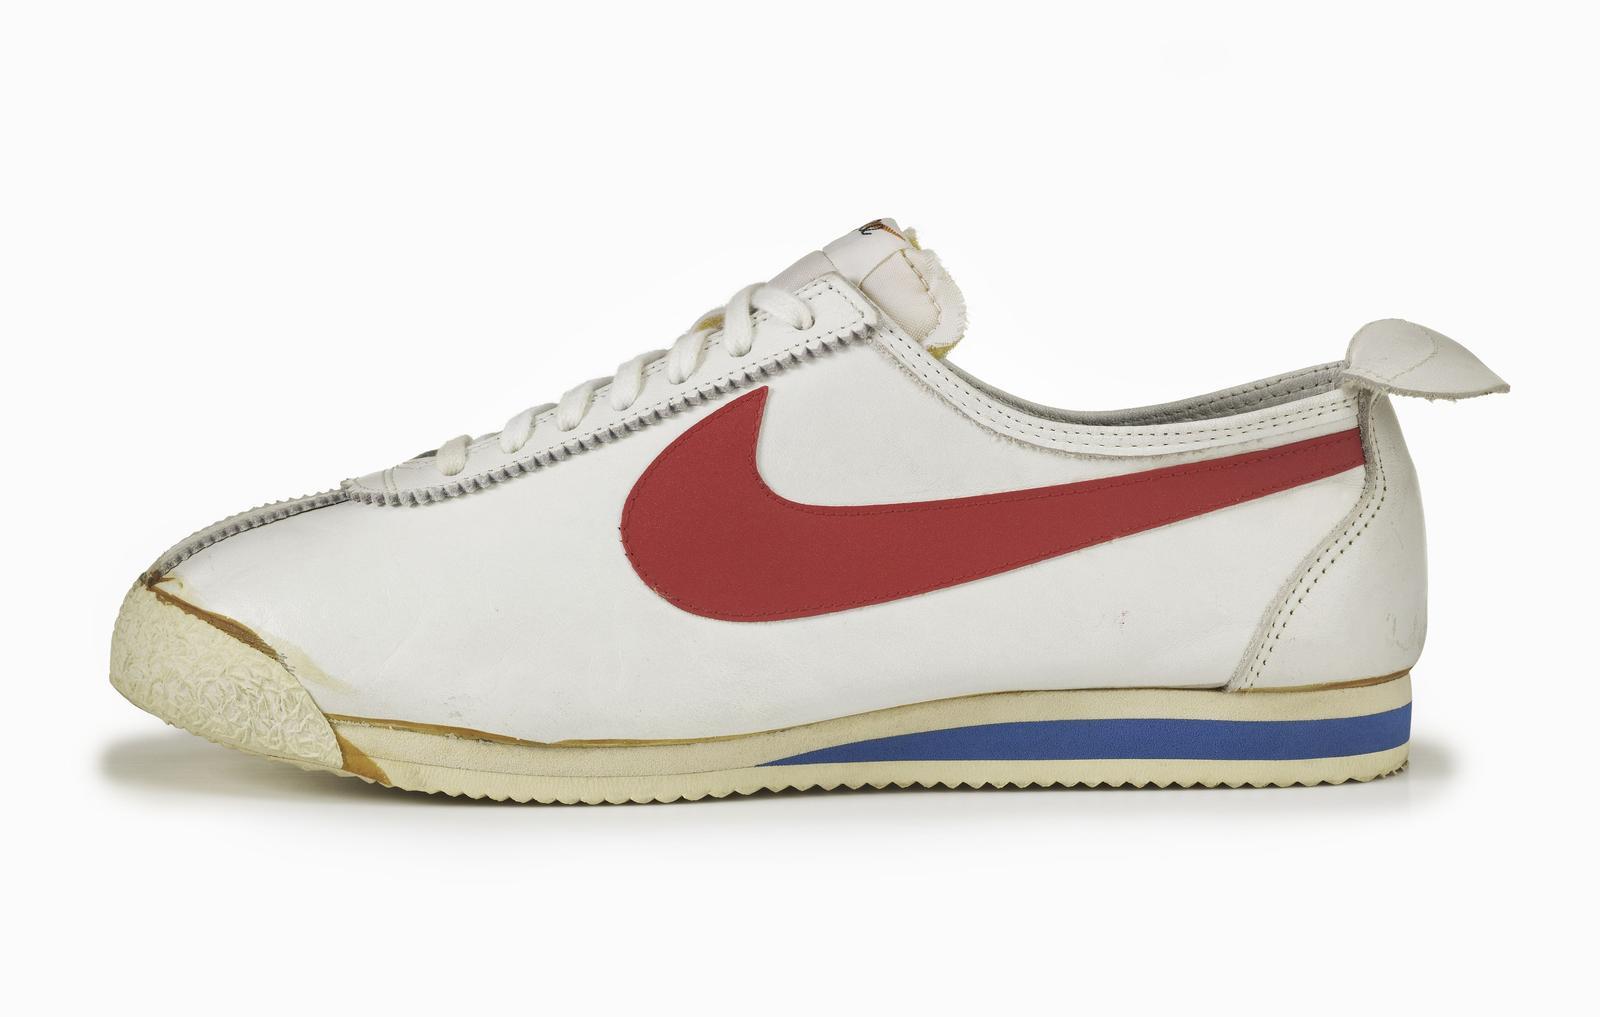 Nike Bowerman Running Shoes